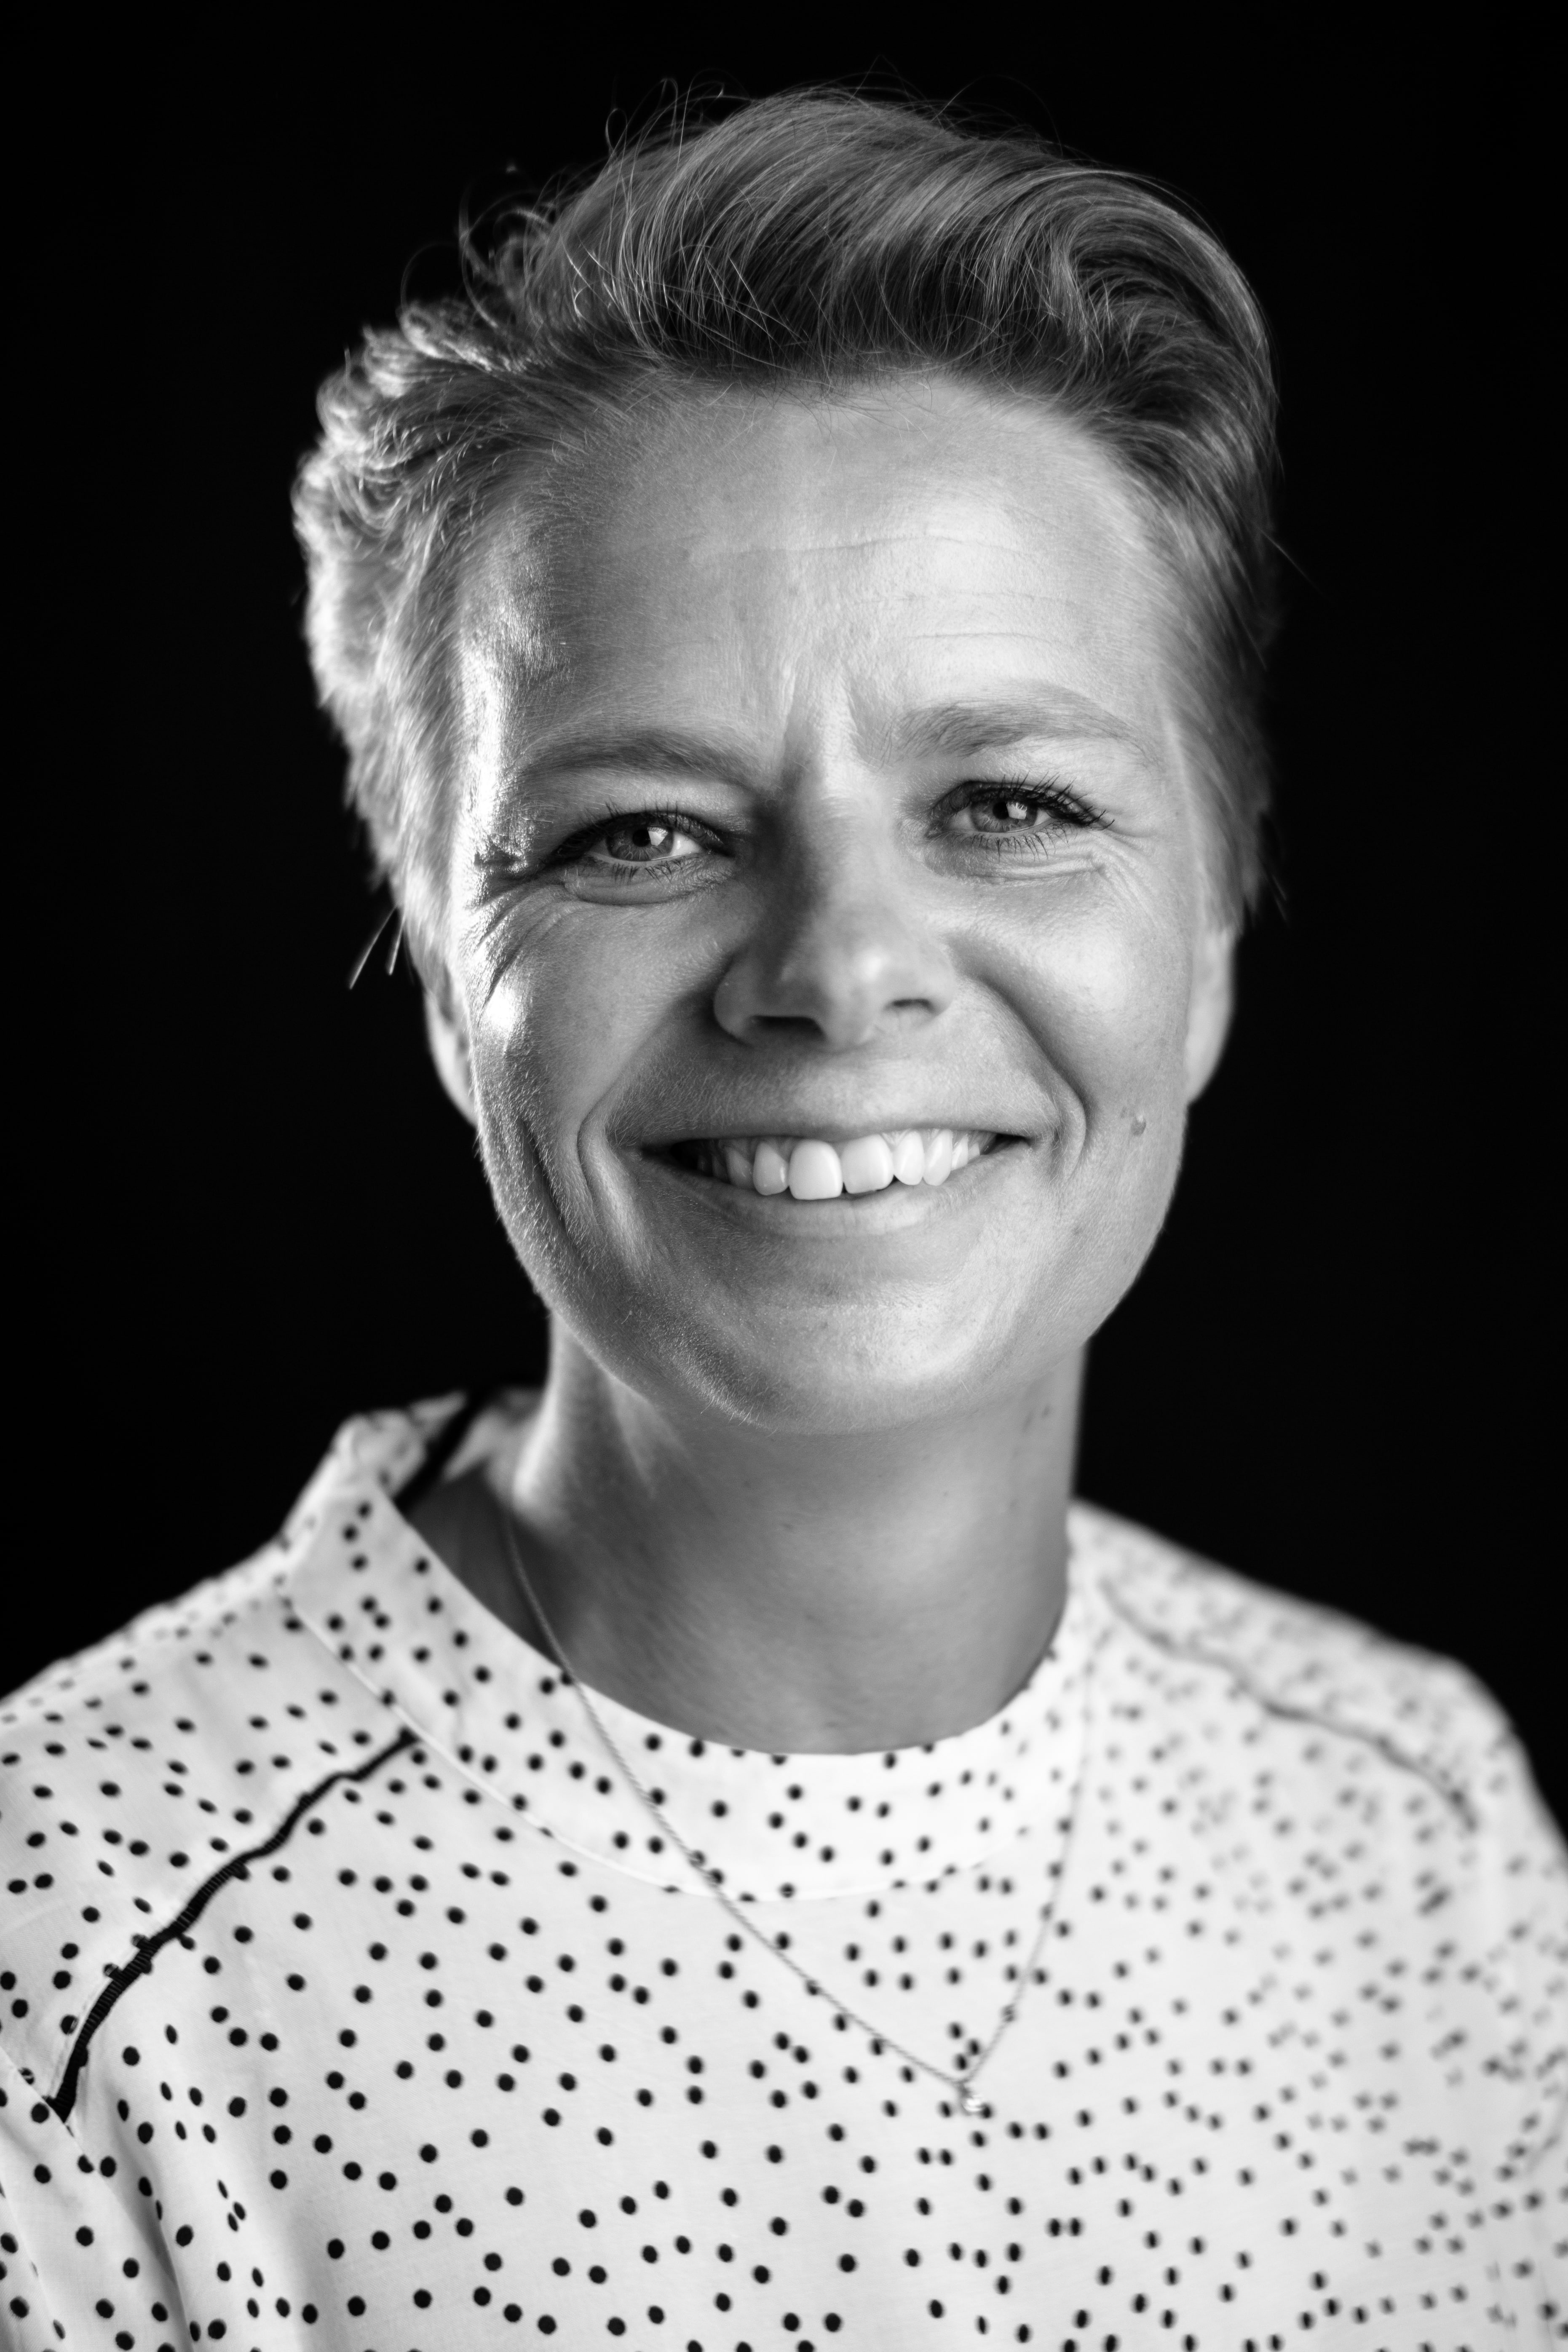 Sofie Filt Laentver